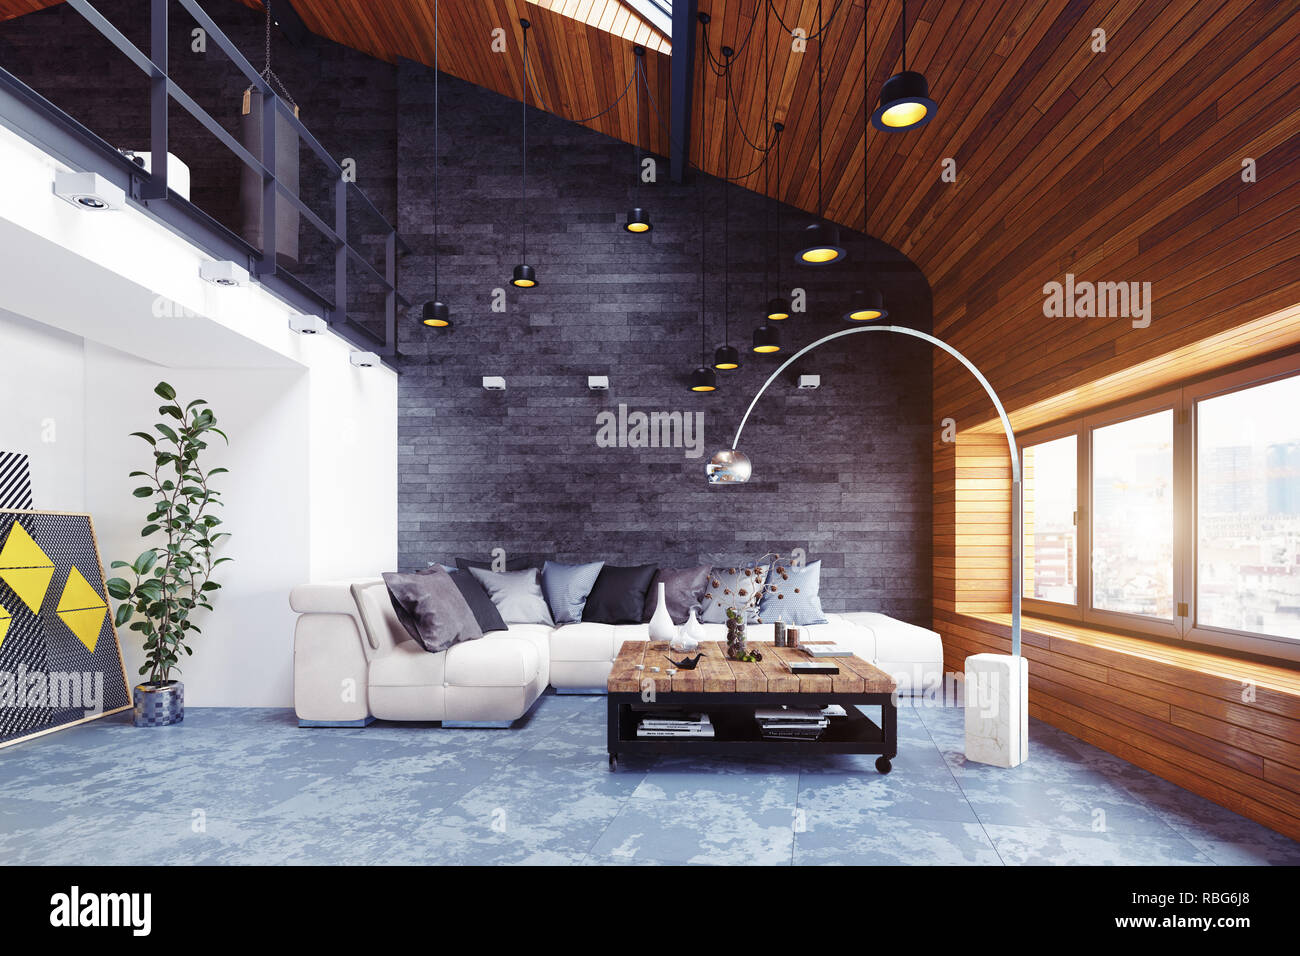 Modern Loft Living Room Interior 3d Rendering Design Concept Stock Photo Alamy